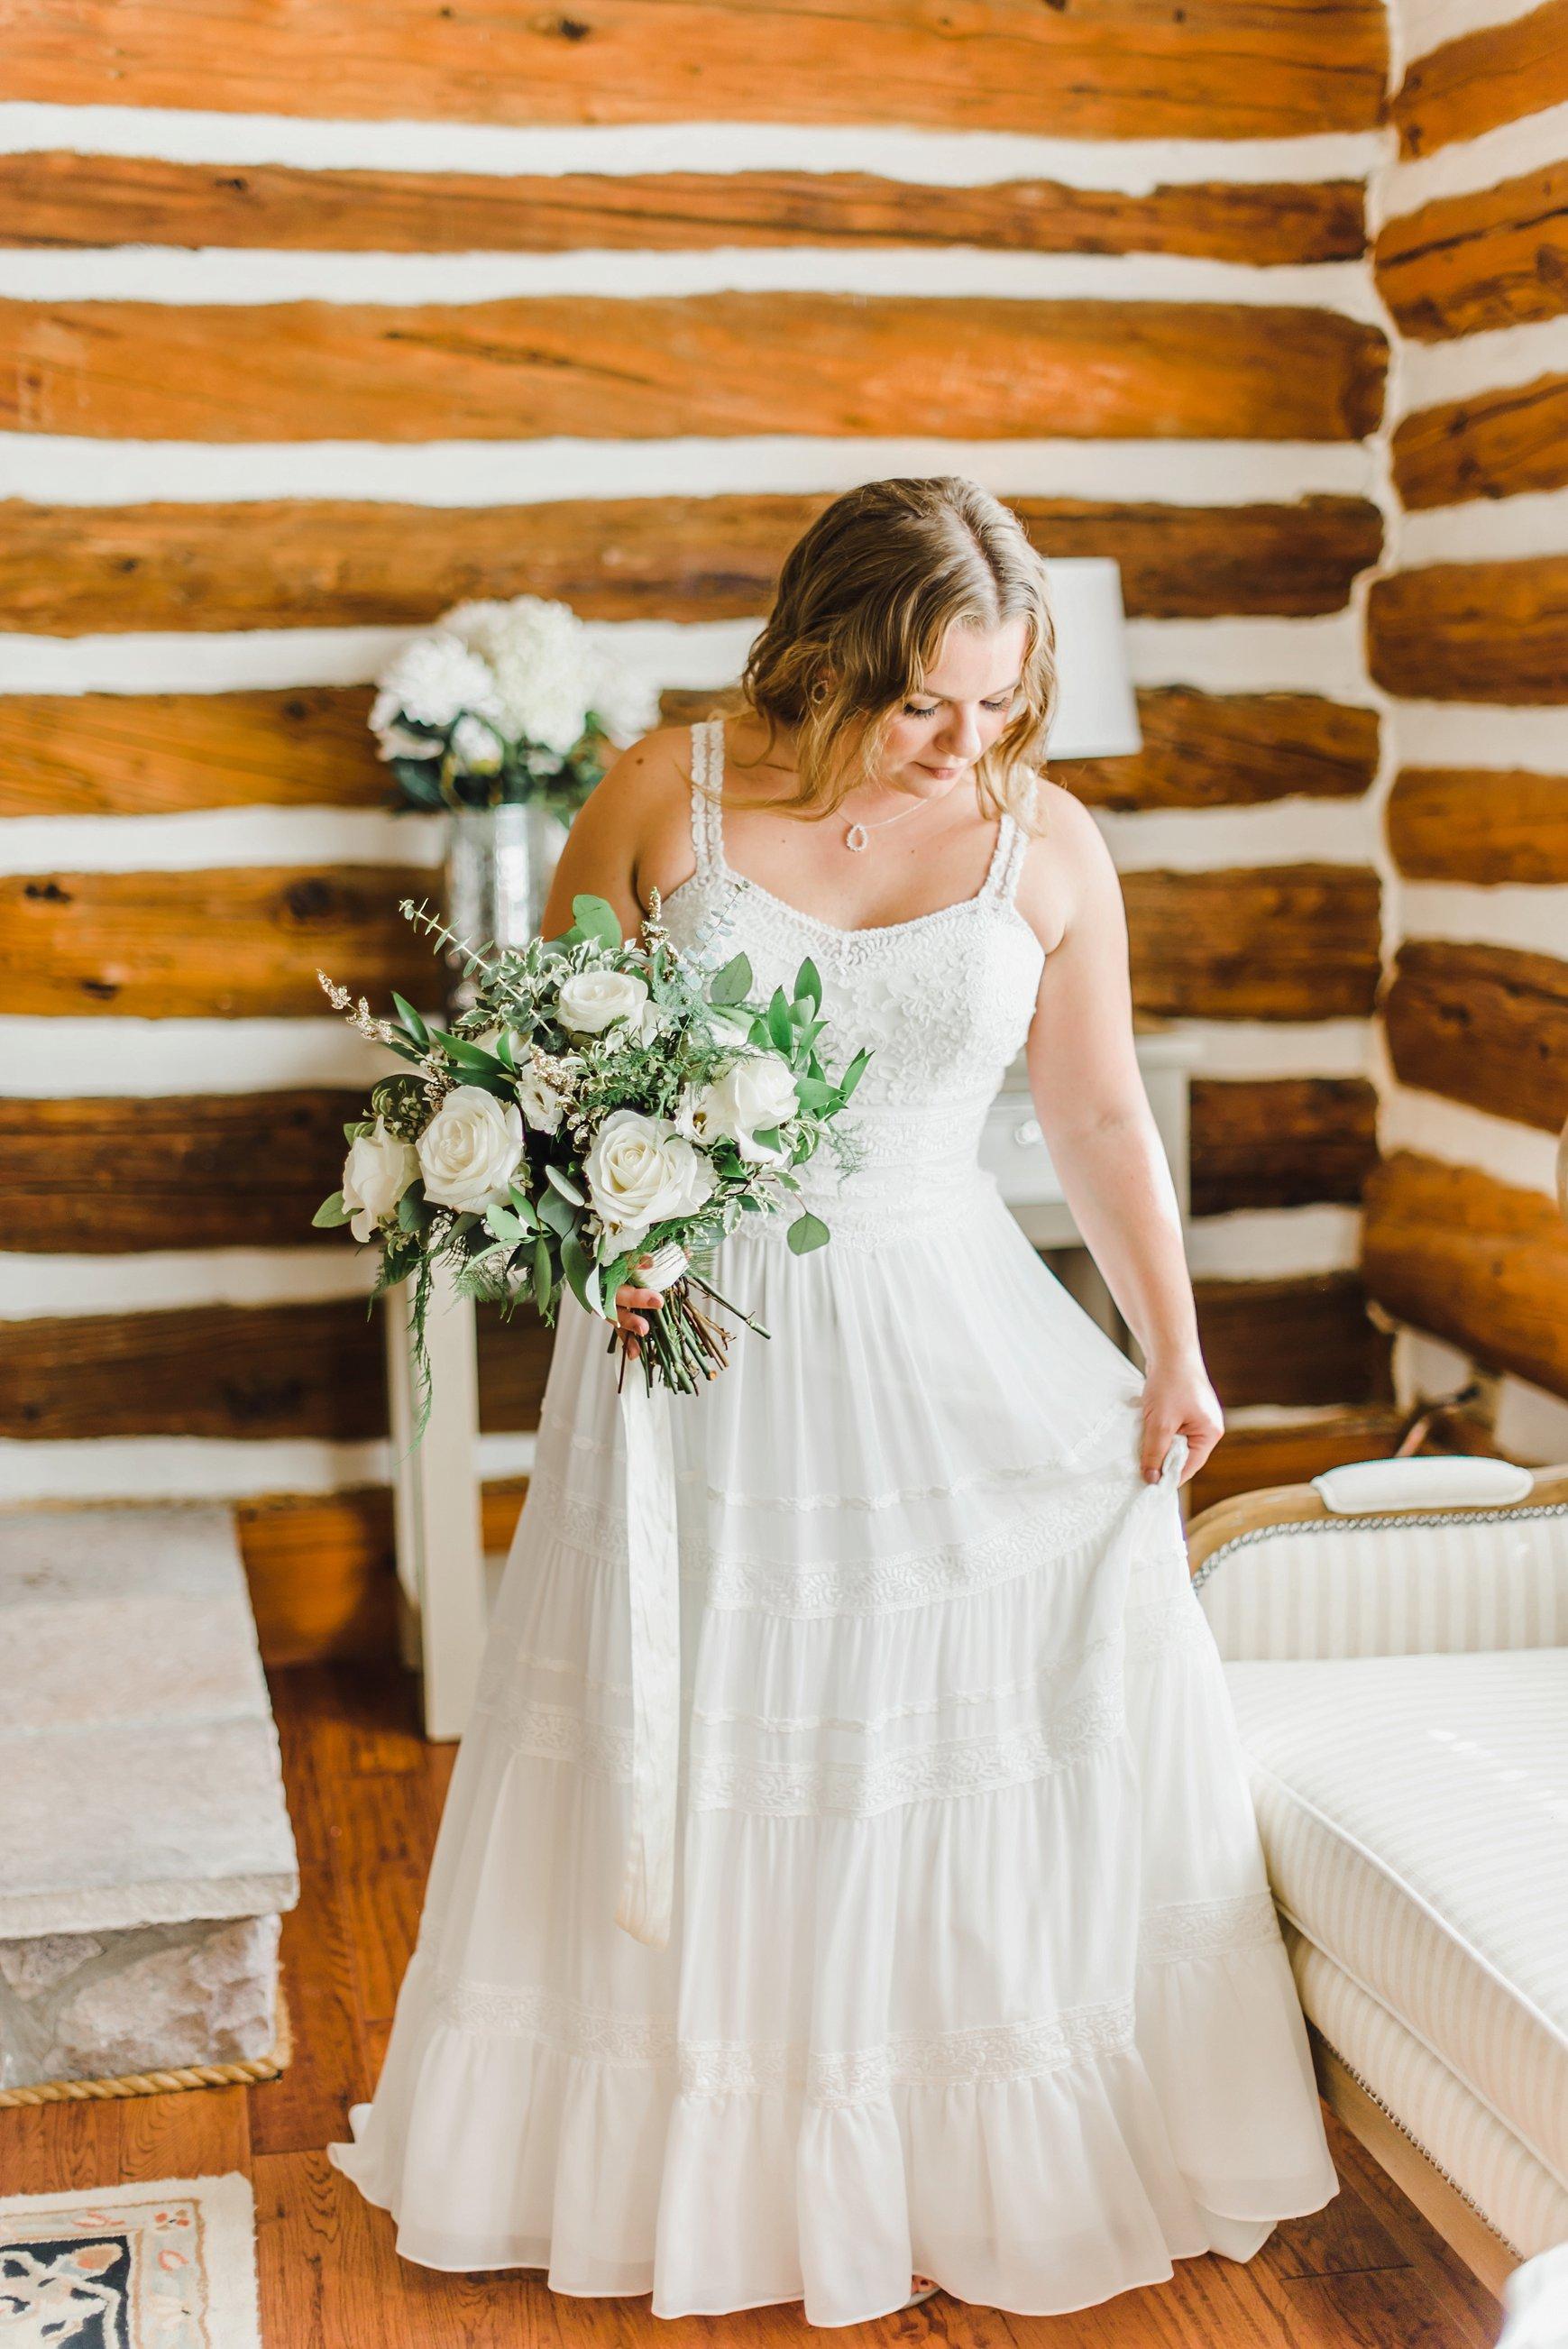 light airy indie fine art ottawa wedding photographer | Ali and Batoul Photography_1069.jpg